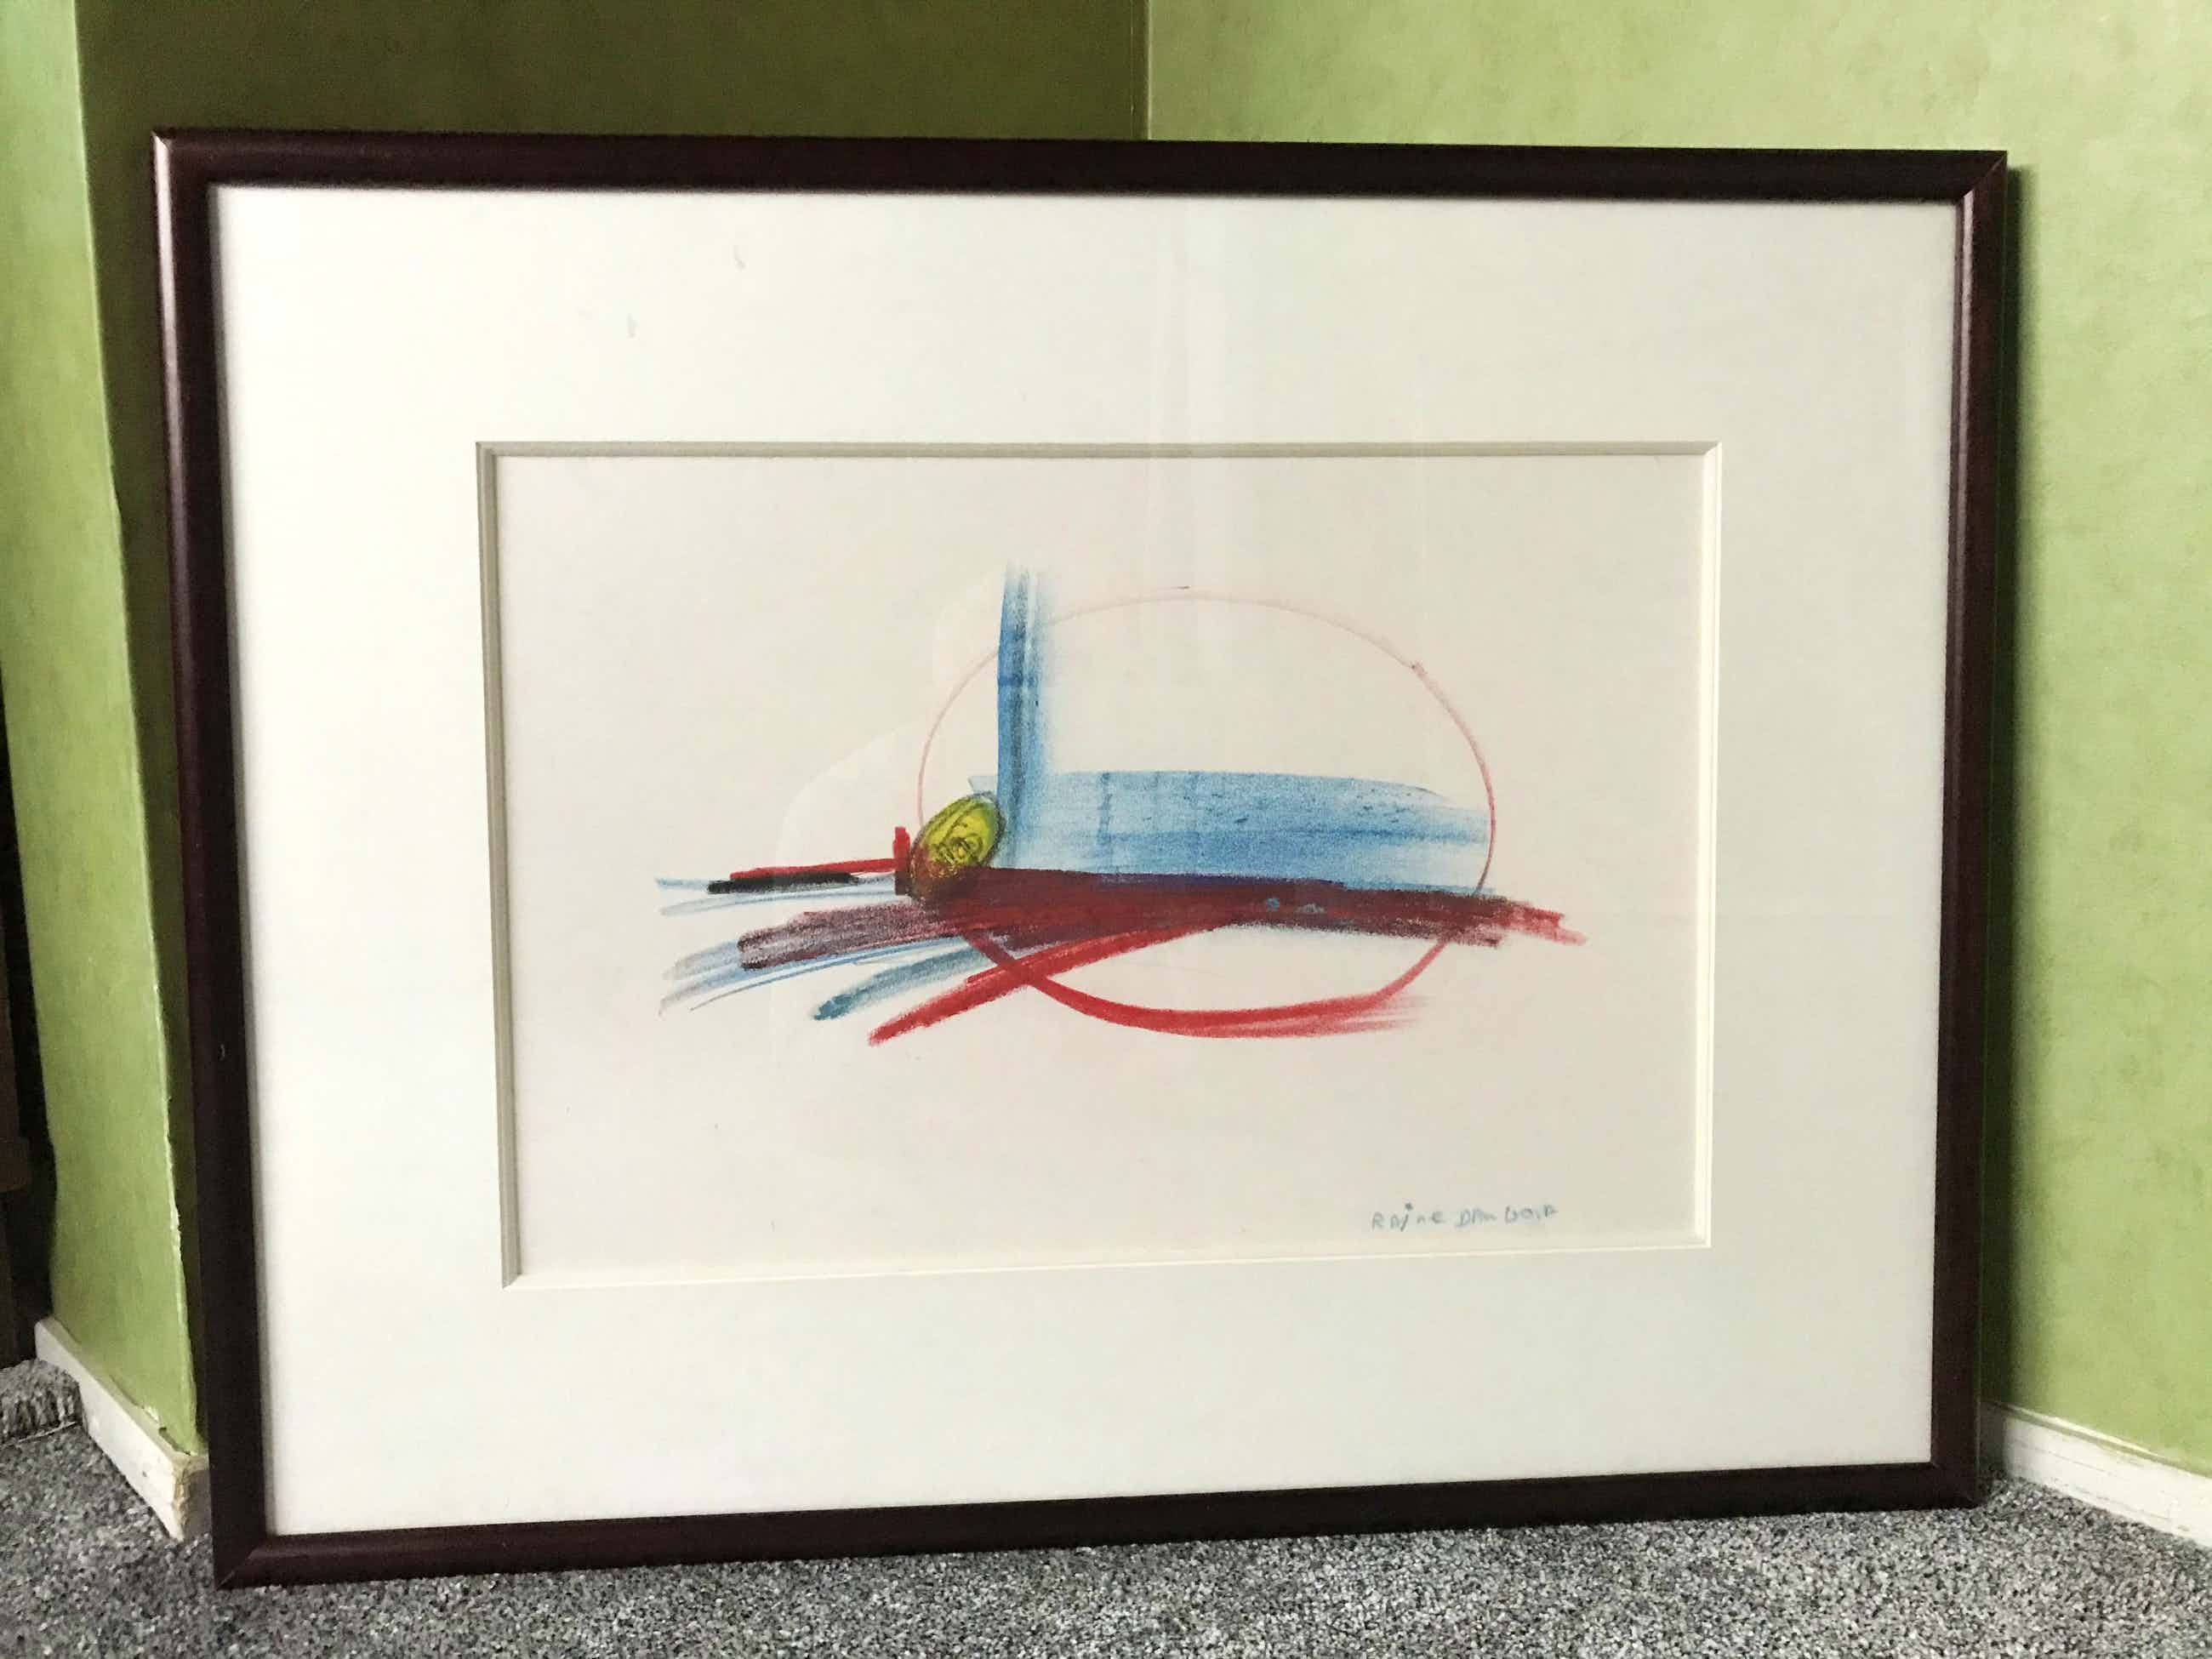 Rajne Dangova - Abstract - Nr 47 van 50 - 1988 kopen? Bied vanaf 35!